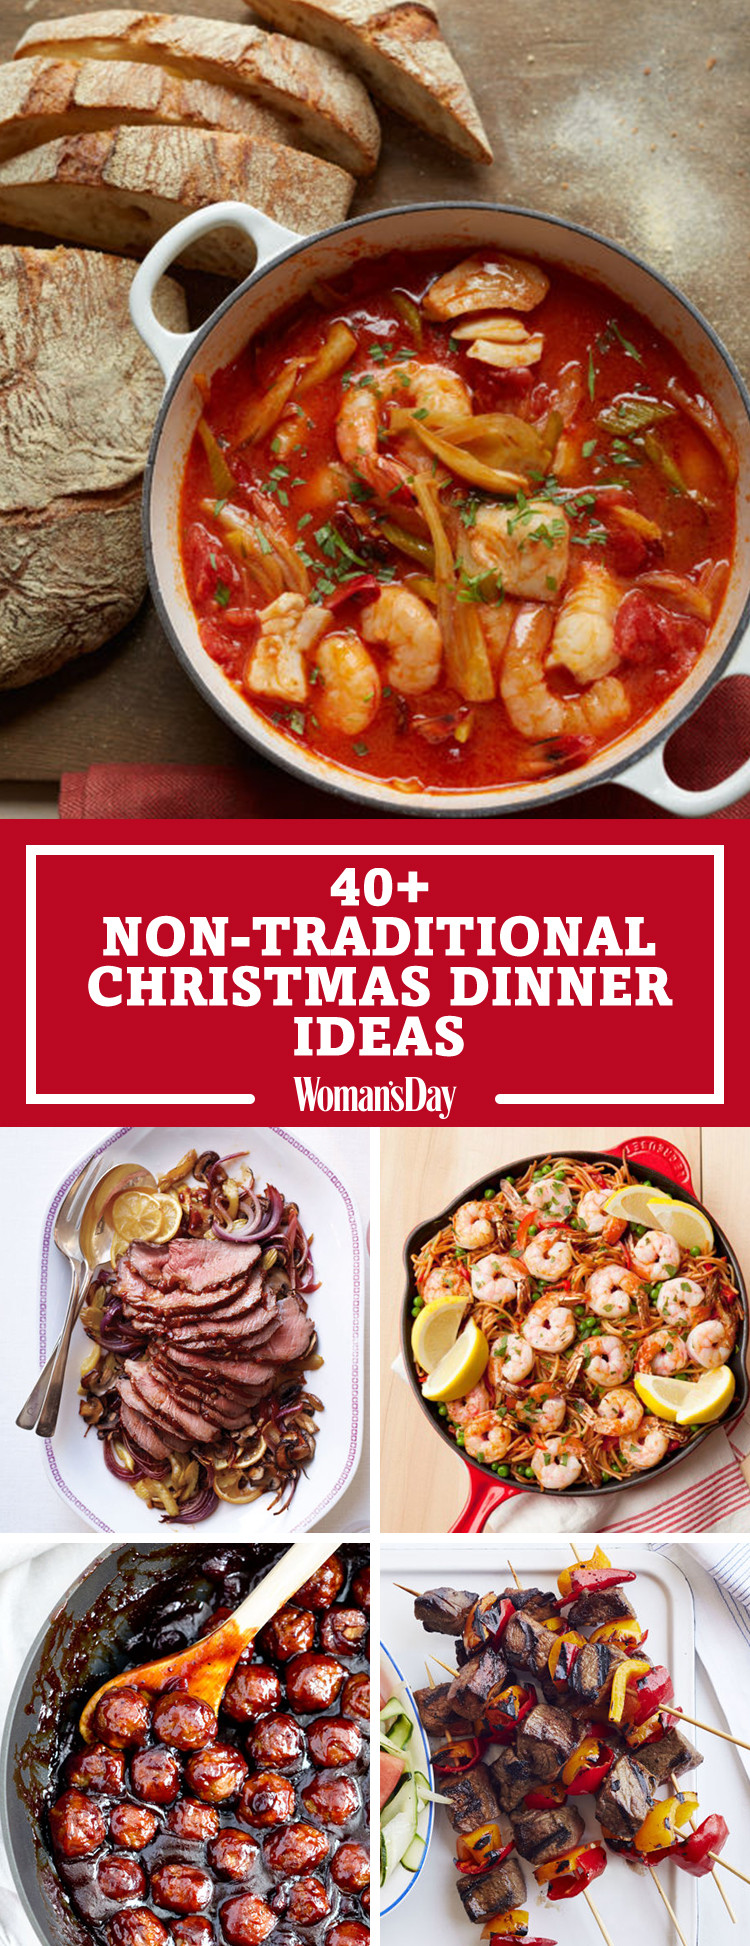 Typical Christmas Dinner  40 Easy Christmas Dinner Ideas Best Recipes for